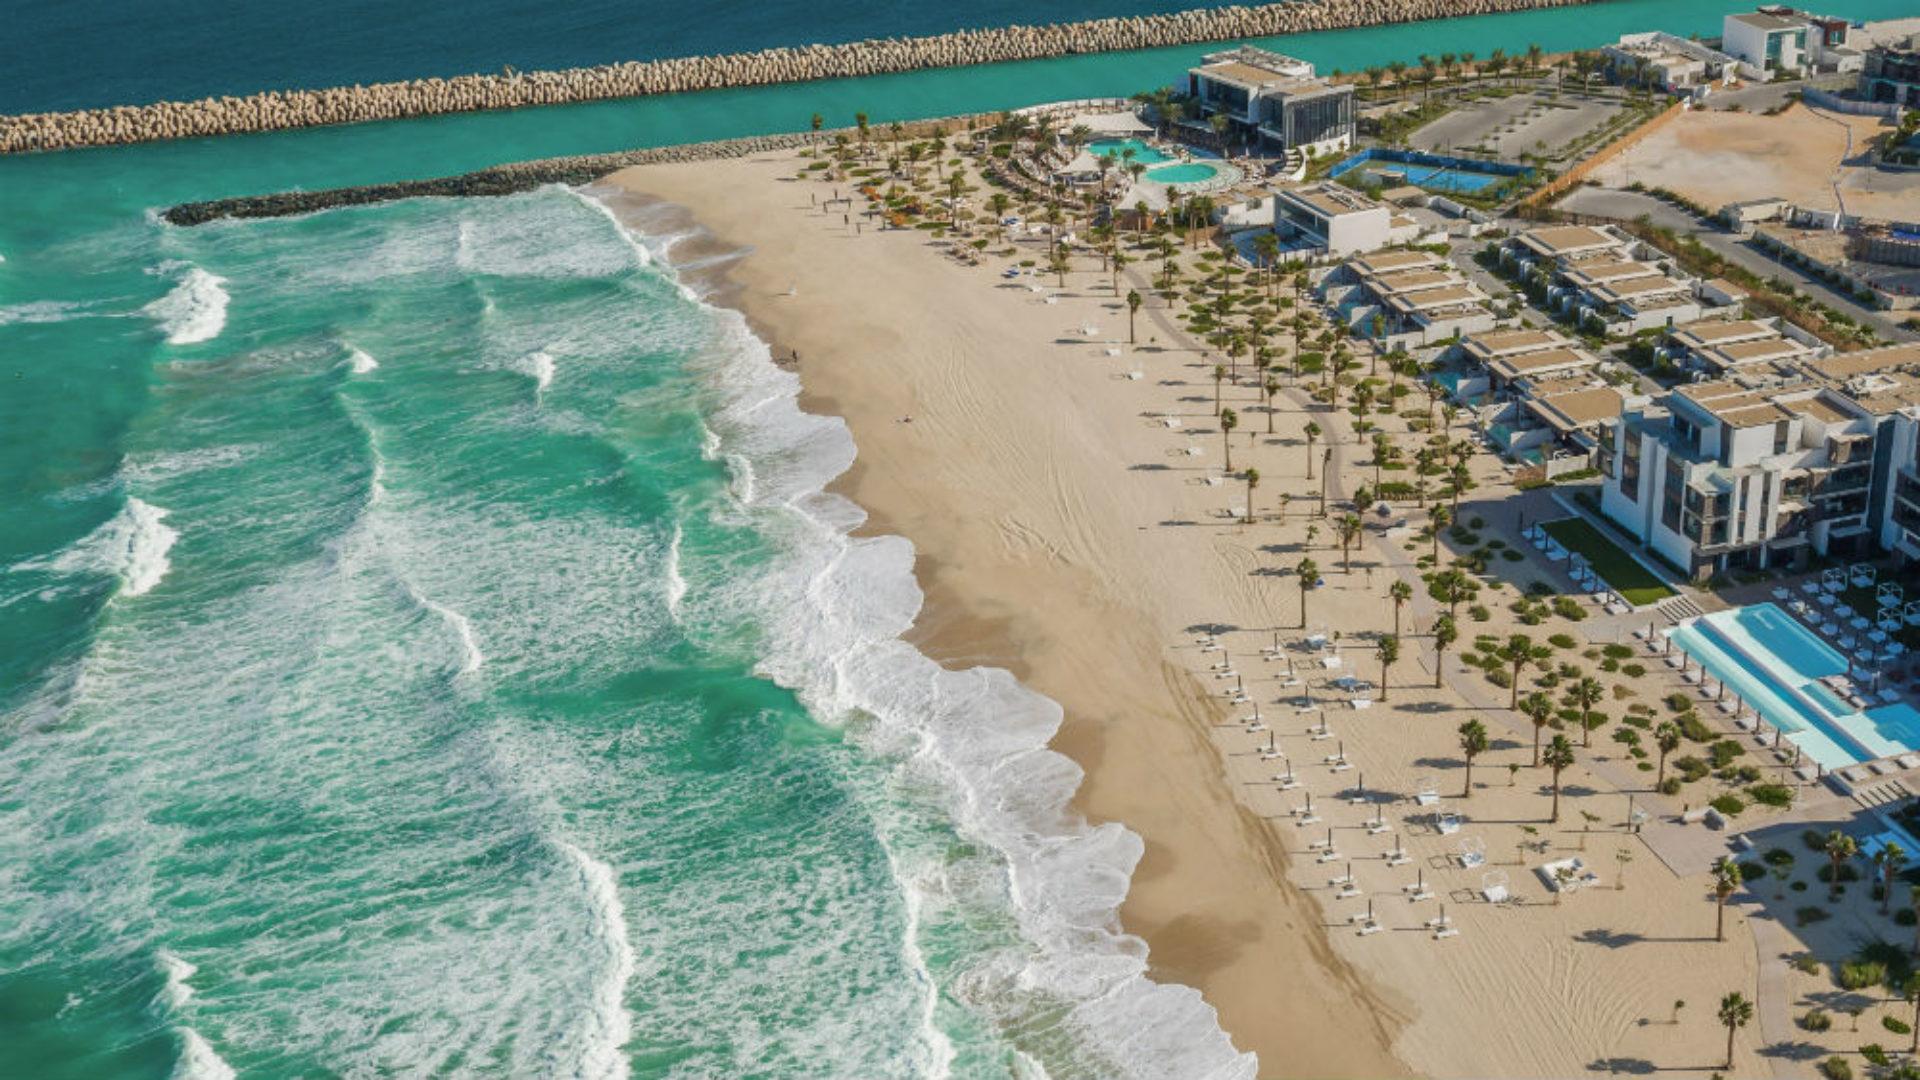 Aerial view of the beach at Nikki Beach Resort & Spa